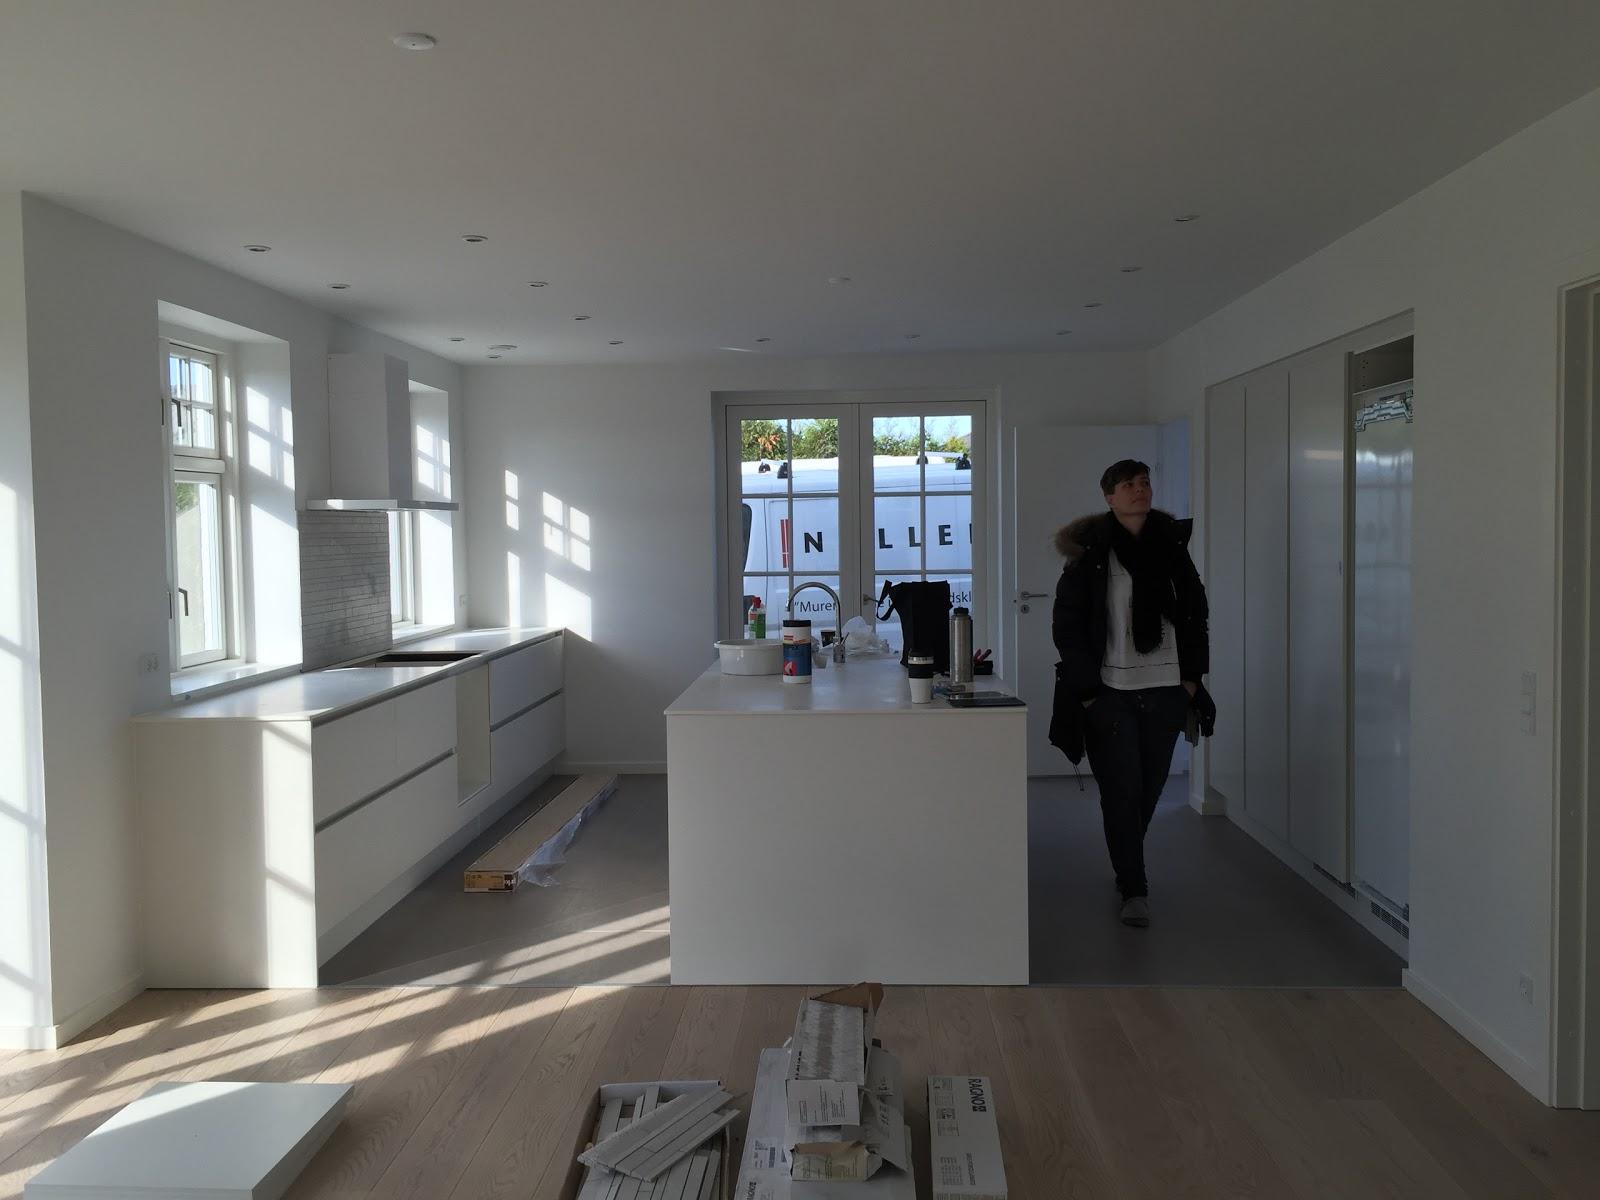 Byggeblog gammel frederiksborgvej helsinge: november 2015